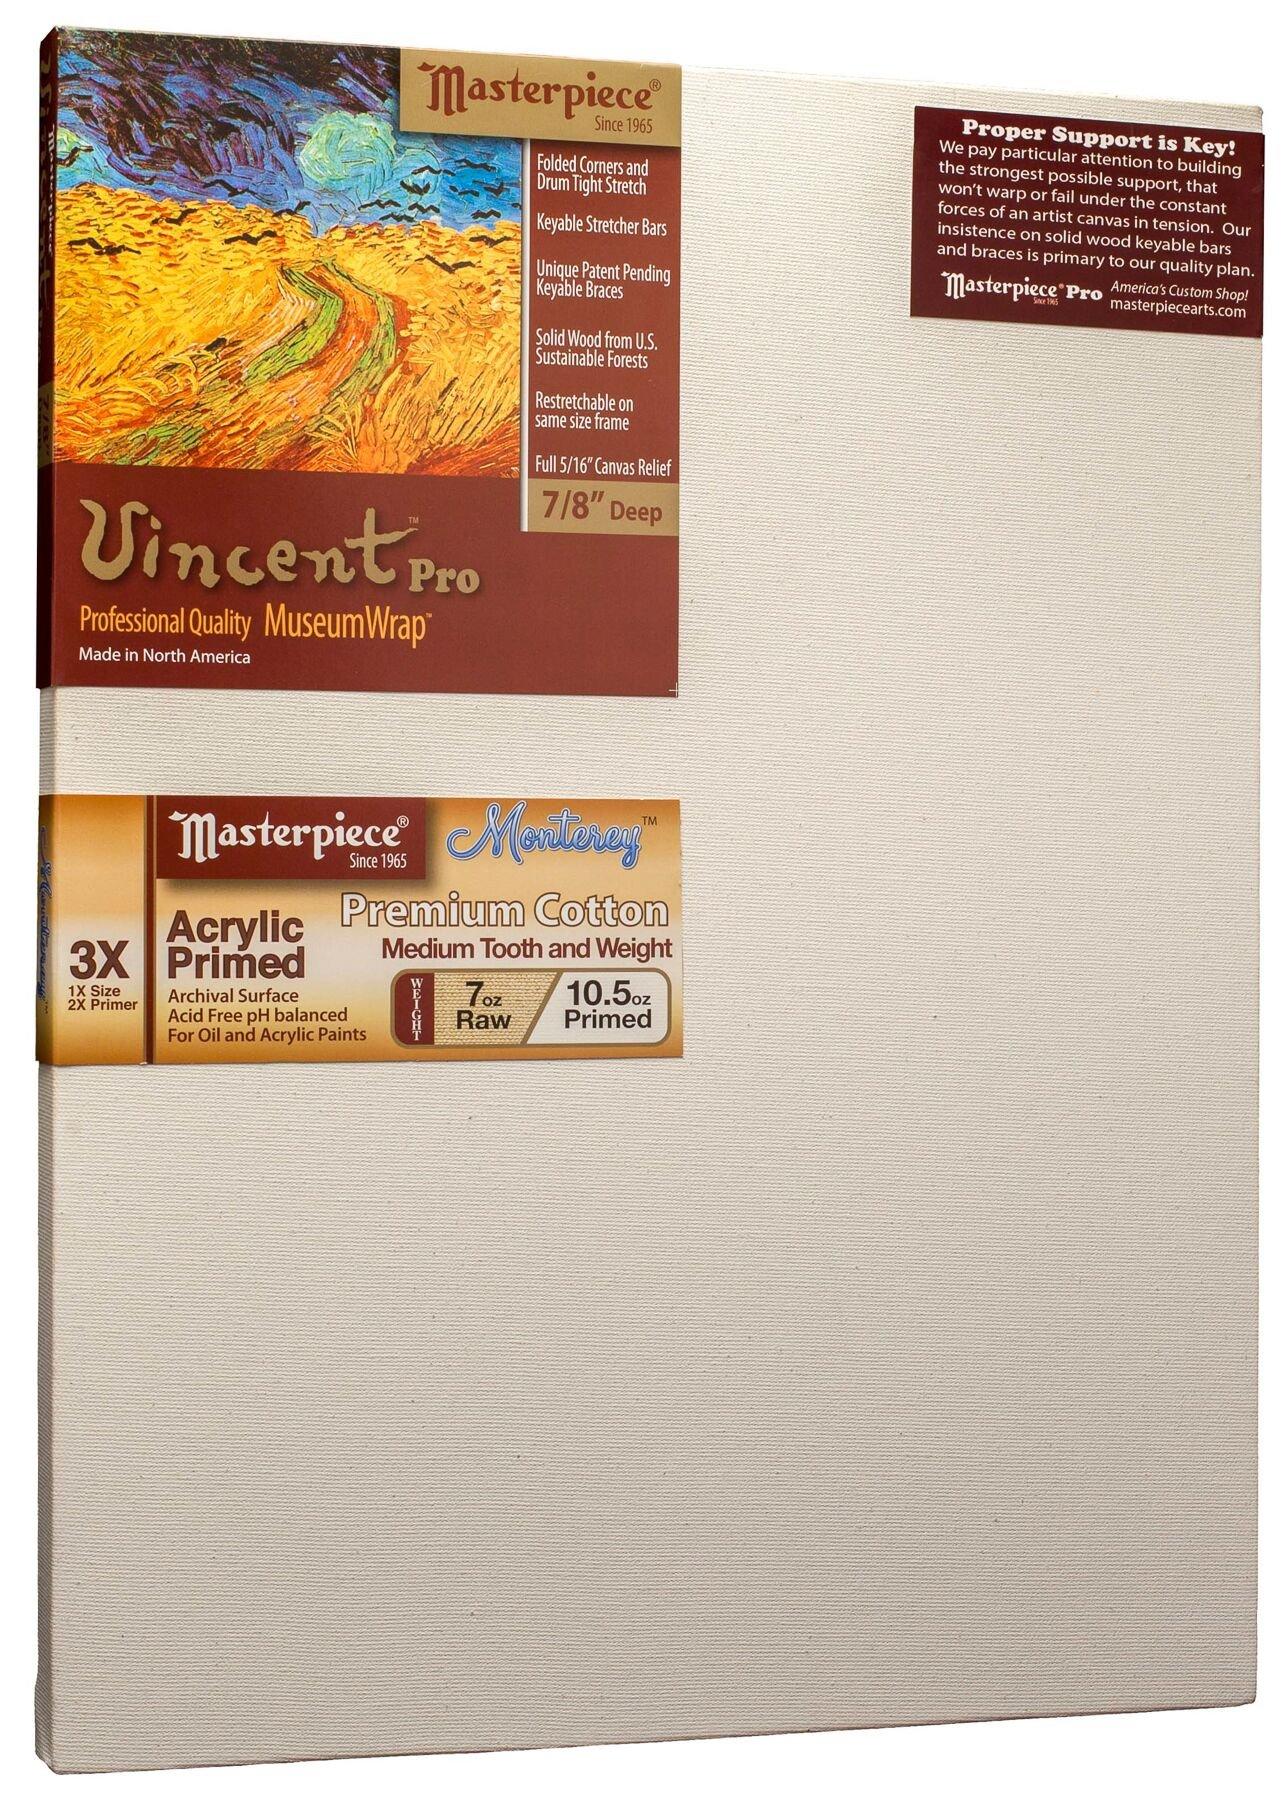 Masterpiece Artist Canvas VM-3654  Vincent Pro 7/8'' Deep, 36'' x 54'',  Cotton 10.5oz - 3X - Monterey Most Popular